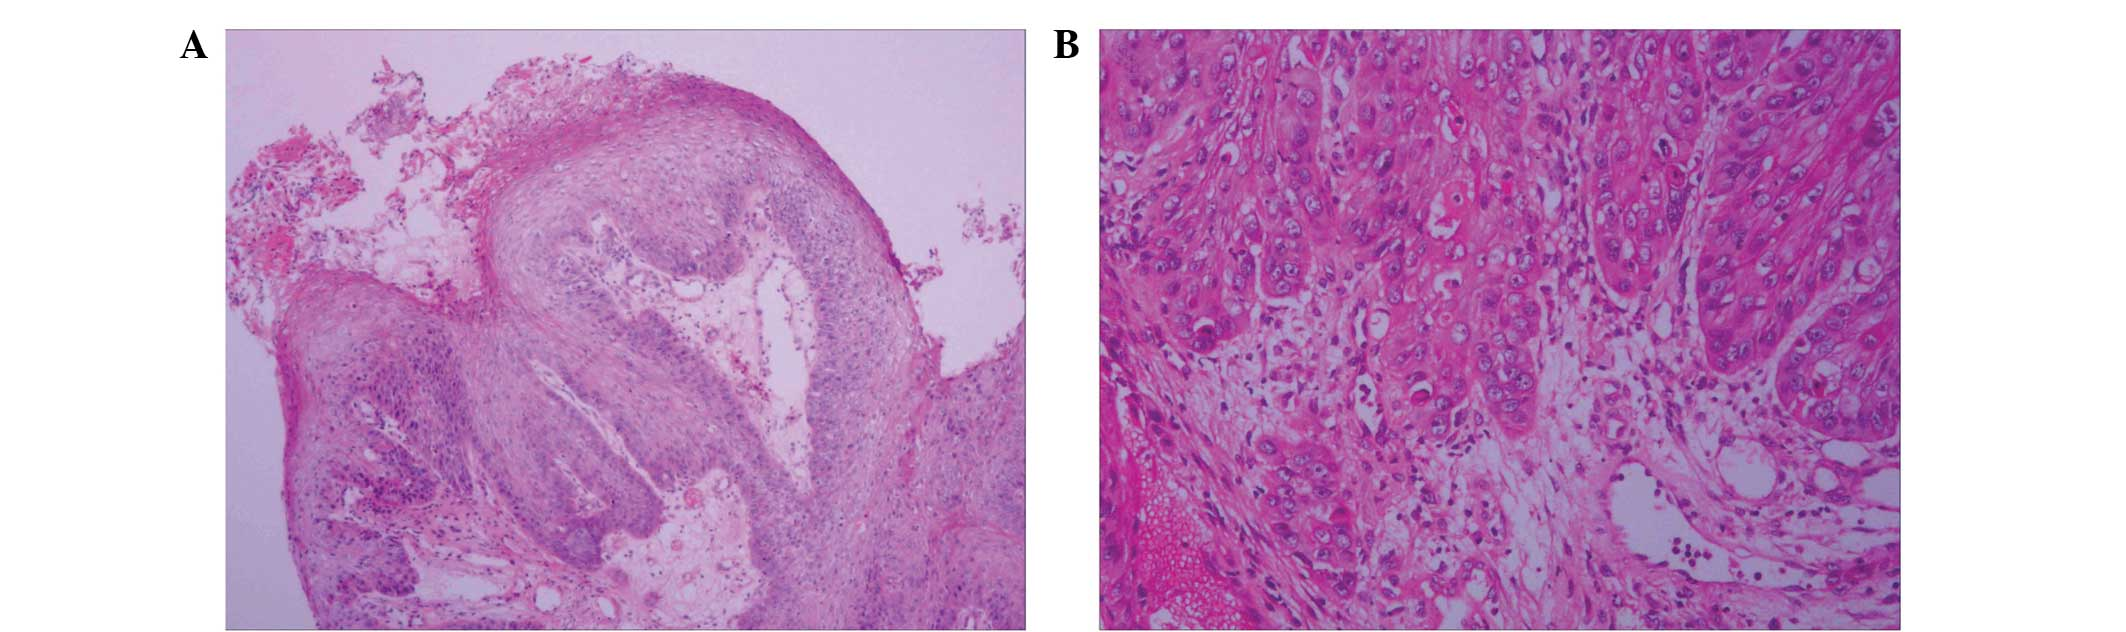 detoxifiere colon cu sucuri papillary thyroid cancer natural treatment